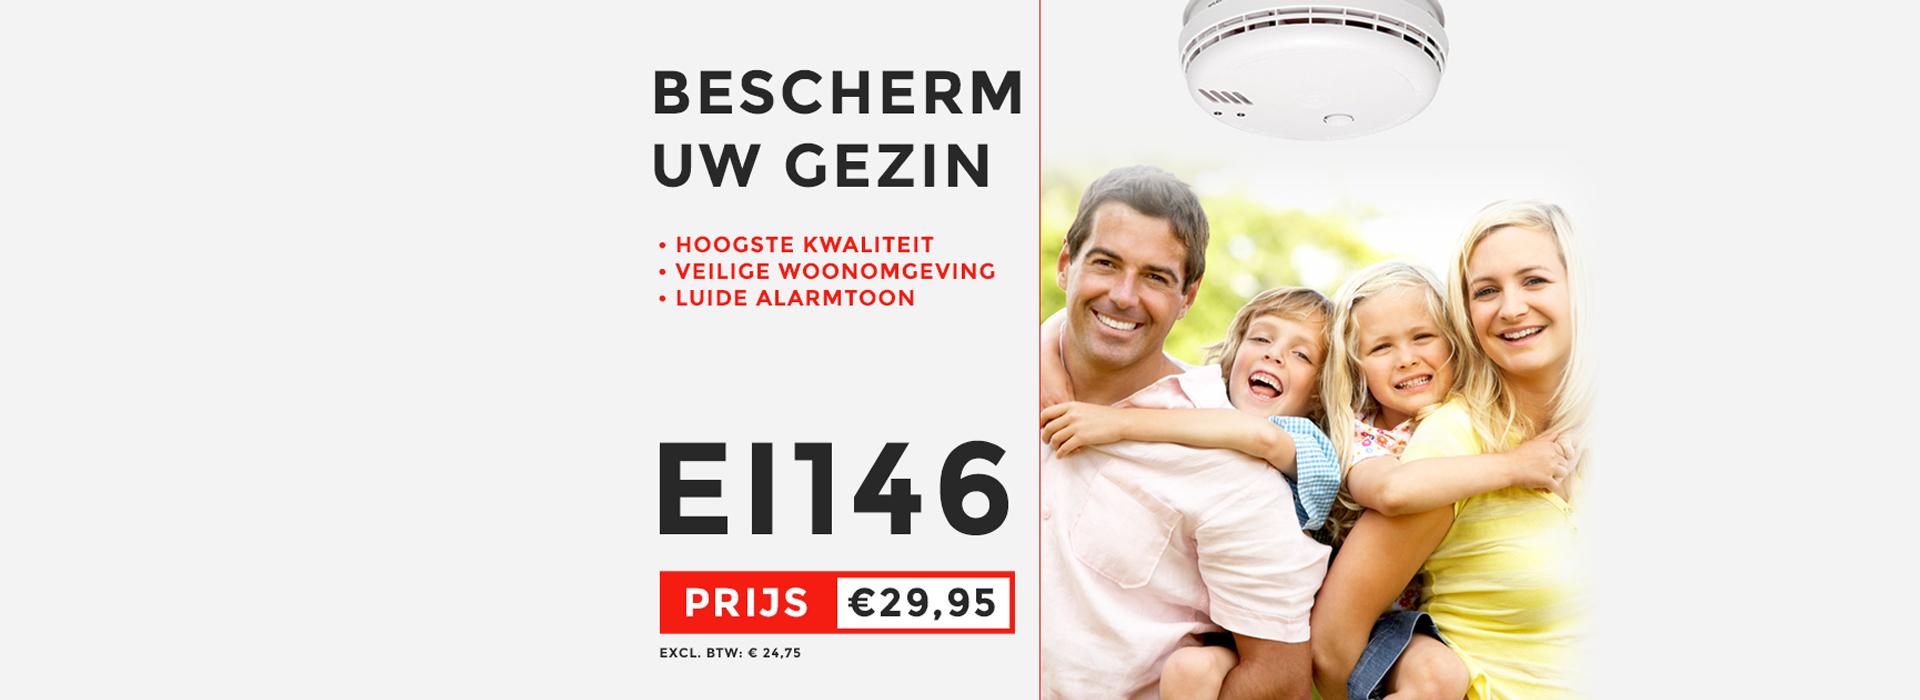 Eibrandmelders.nl